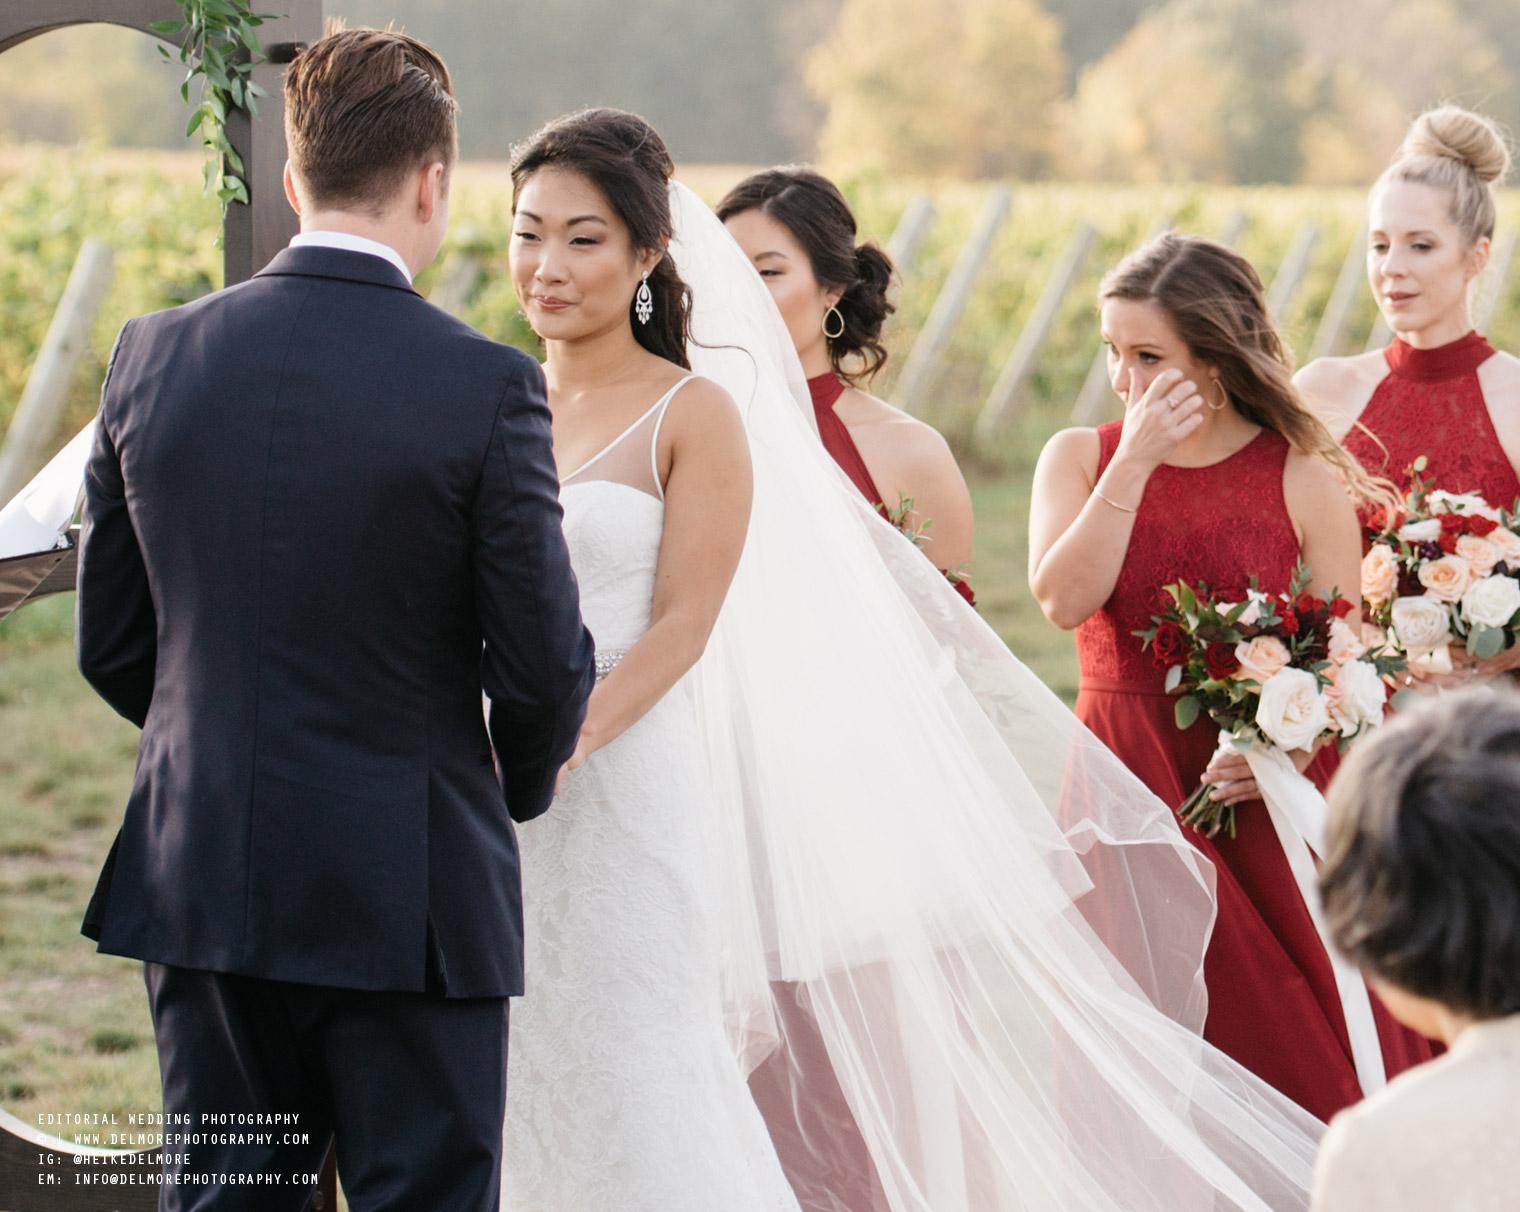 top-windsor-winery-wedding-photographer-037.jpg